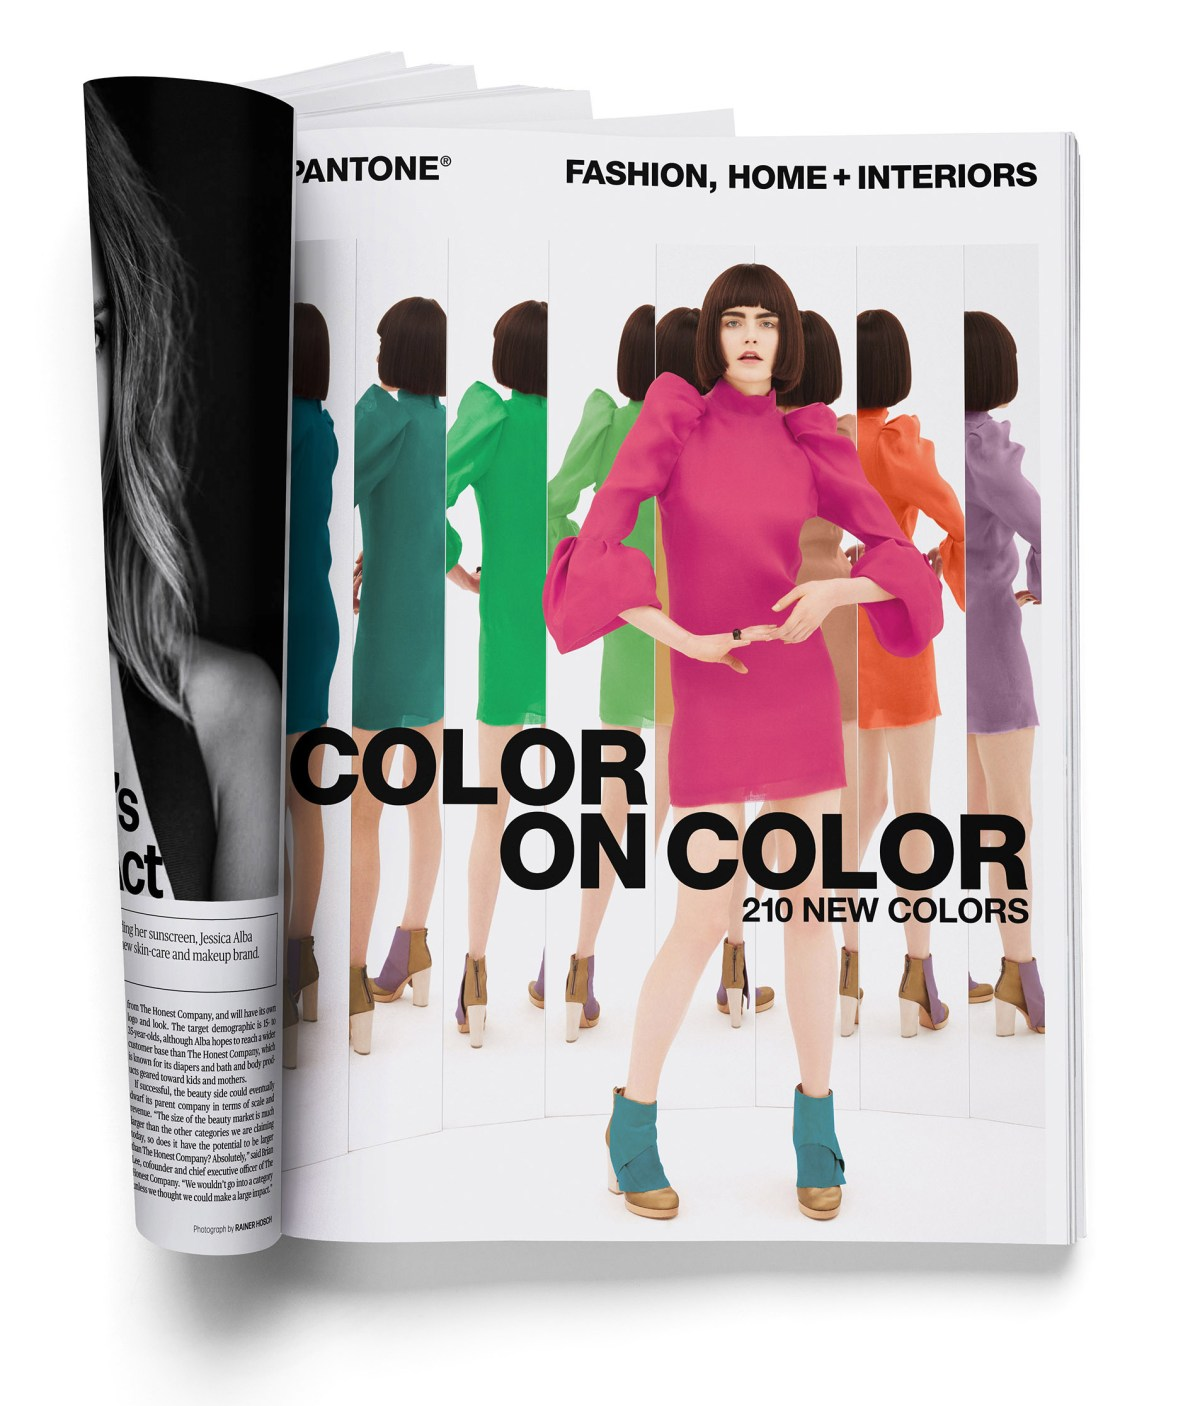 Base Pantone - Color on Color - Ad 01